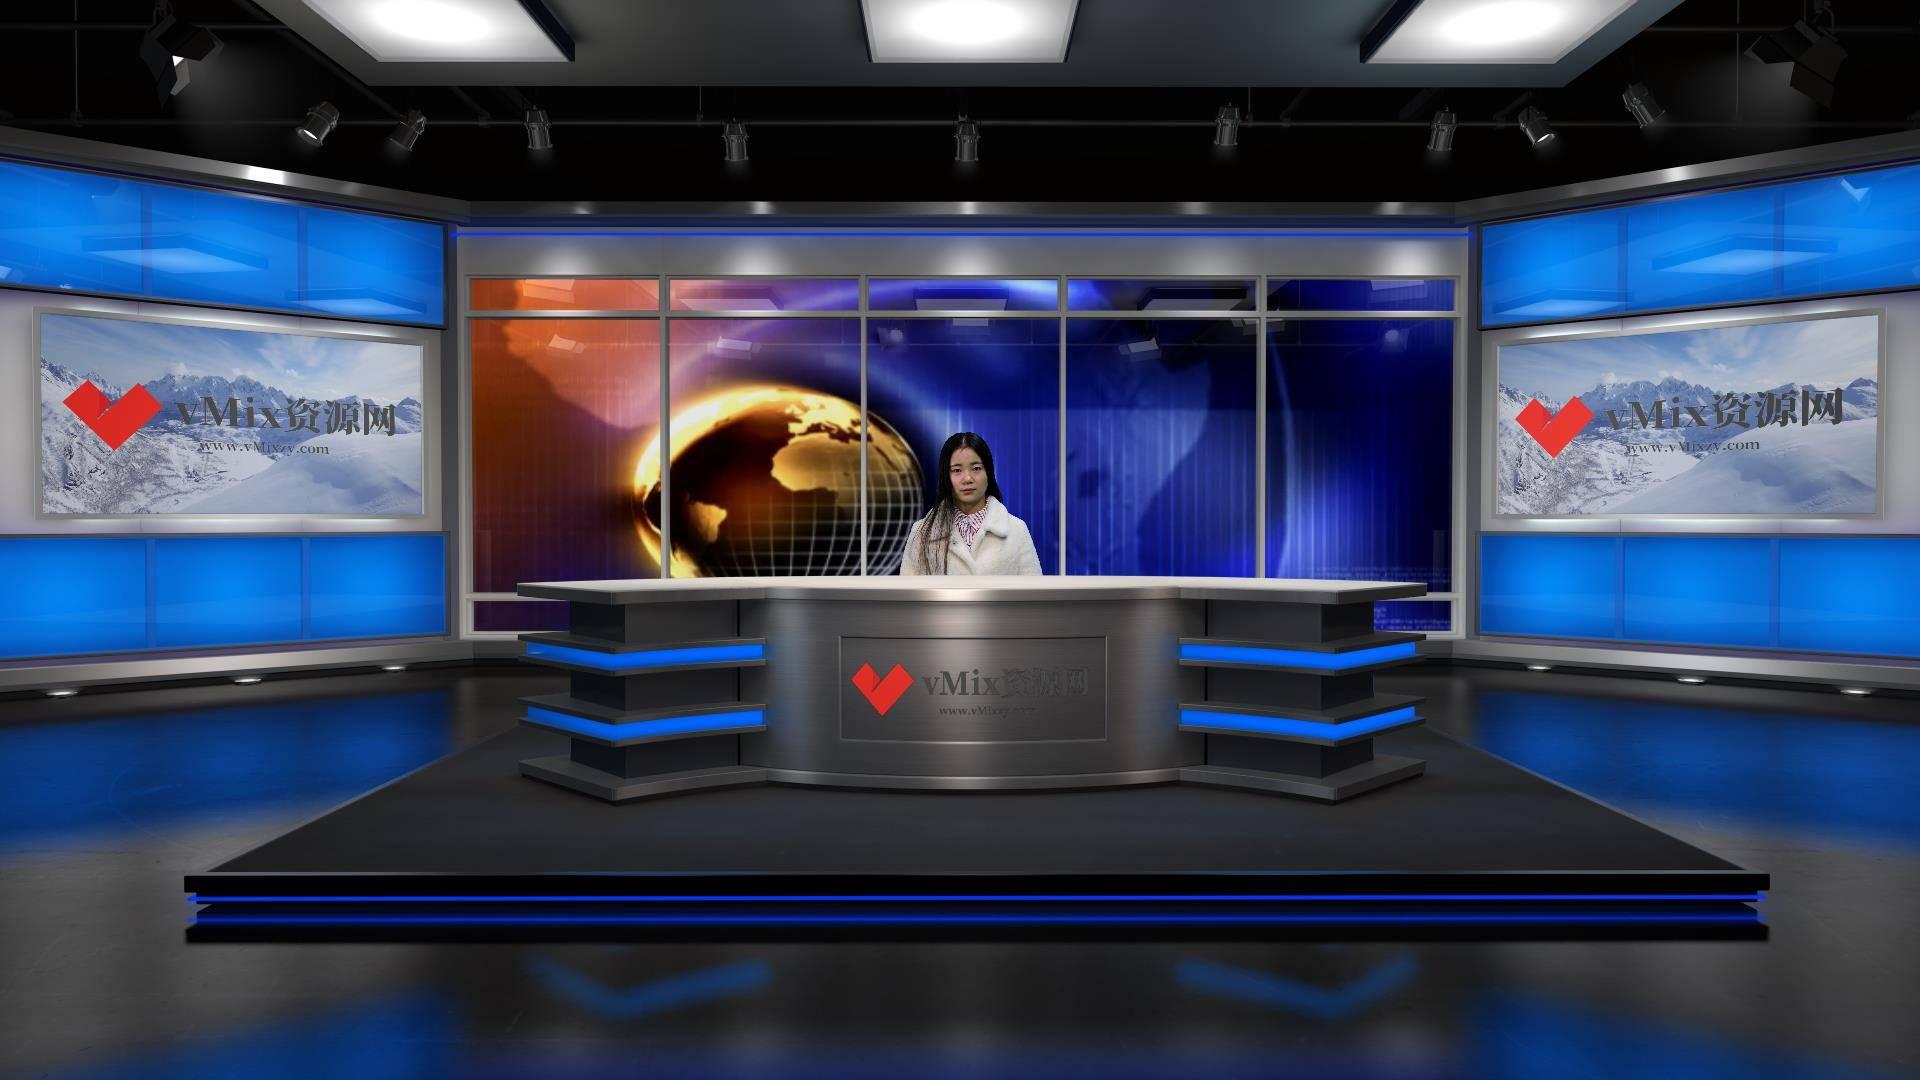 vMix 虚拟集-新闻演播室-001